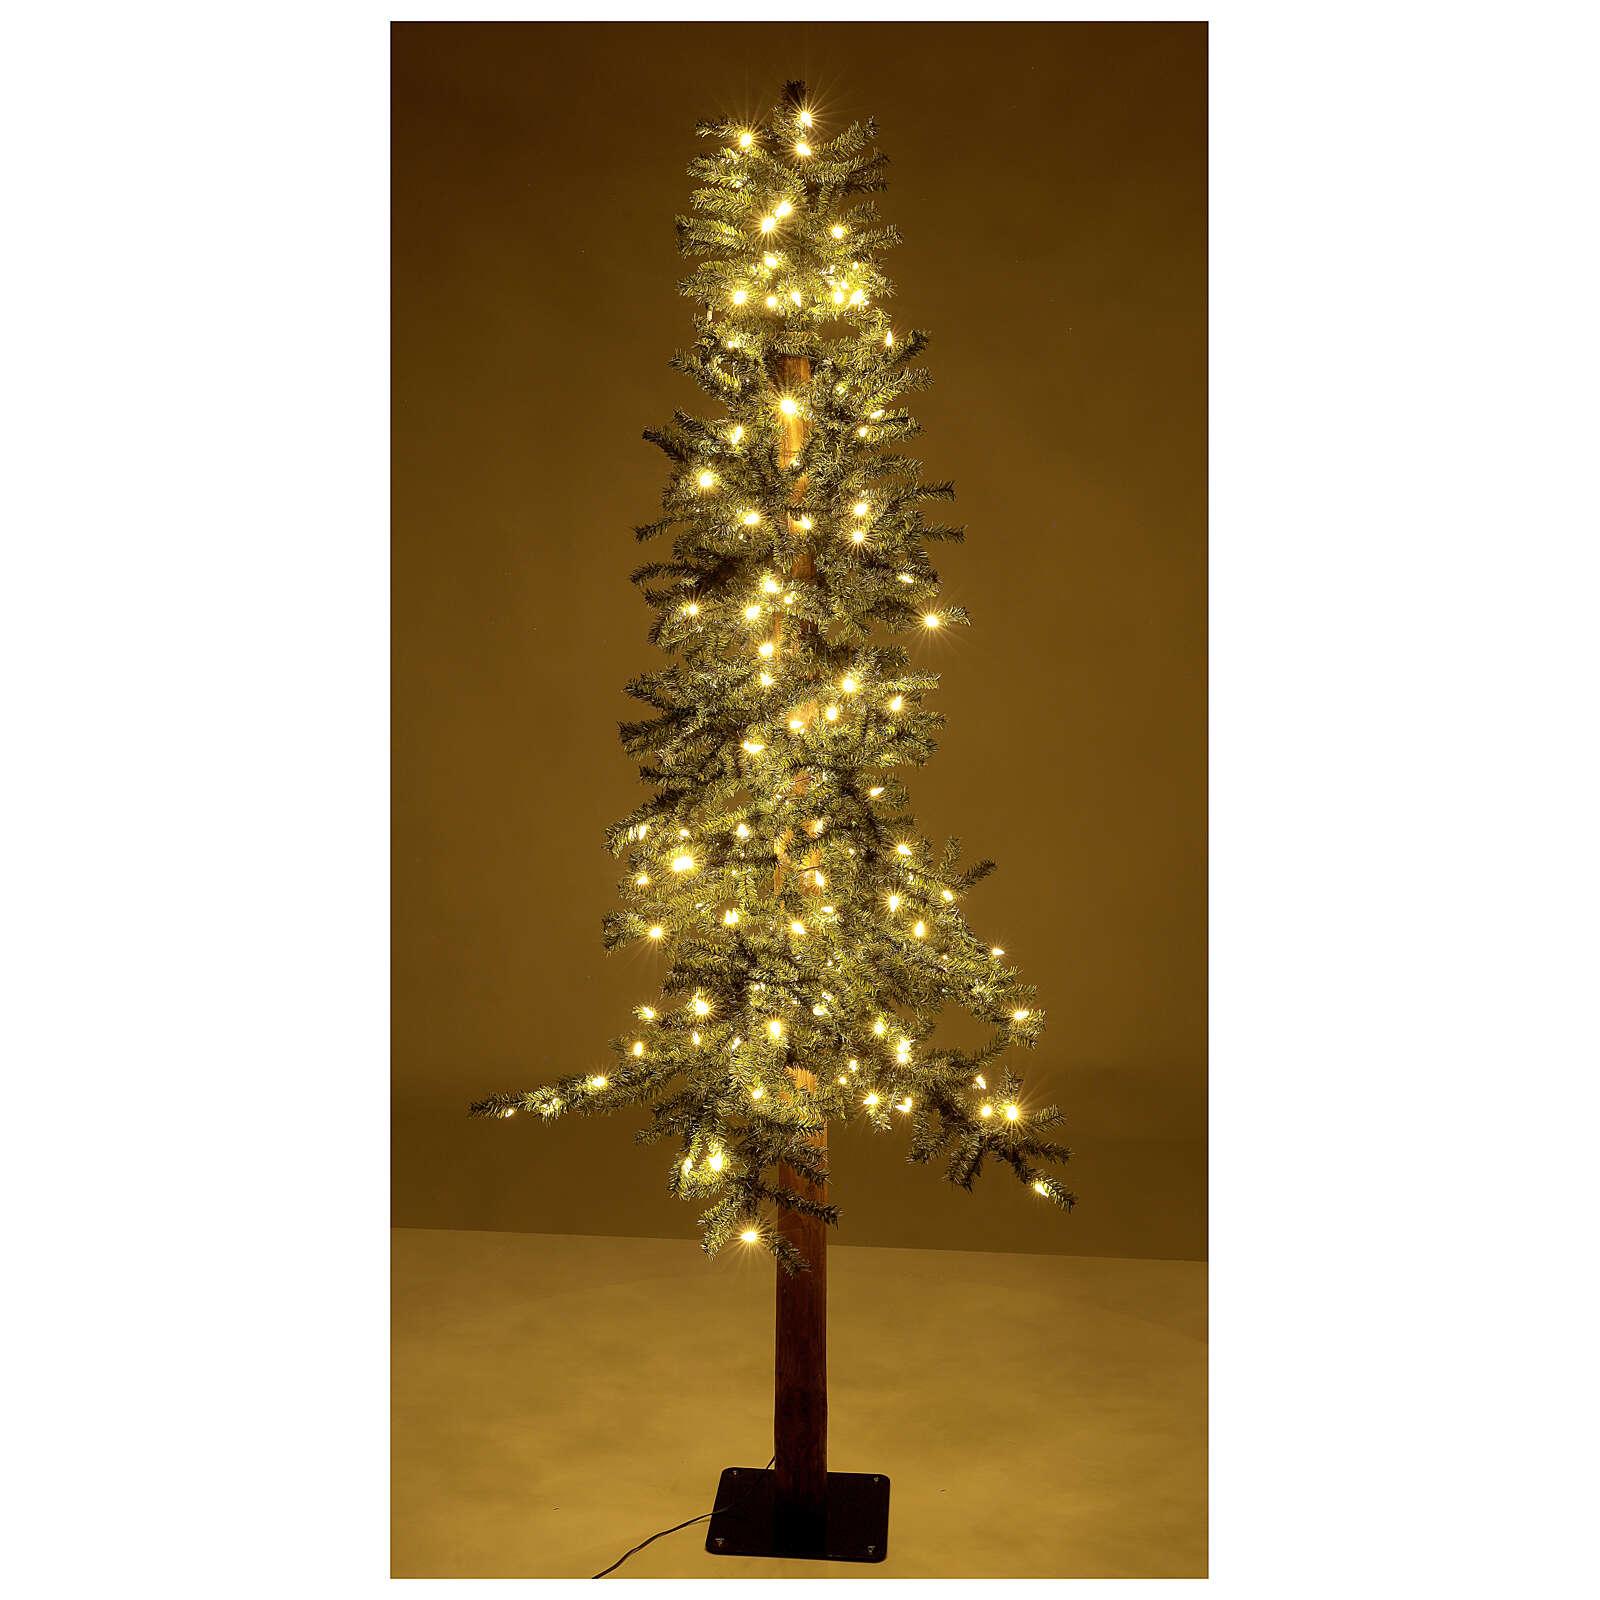 STOCK Árbol Navidad 180 cm Slim Forest 200 led blanco cálido exterior 3